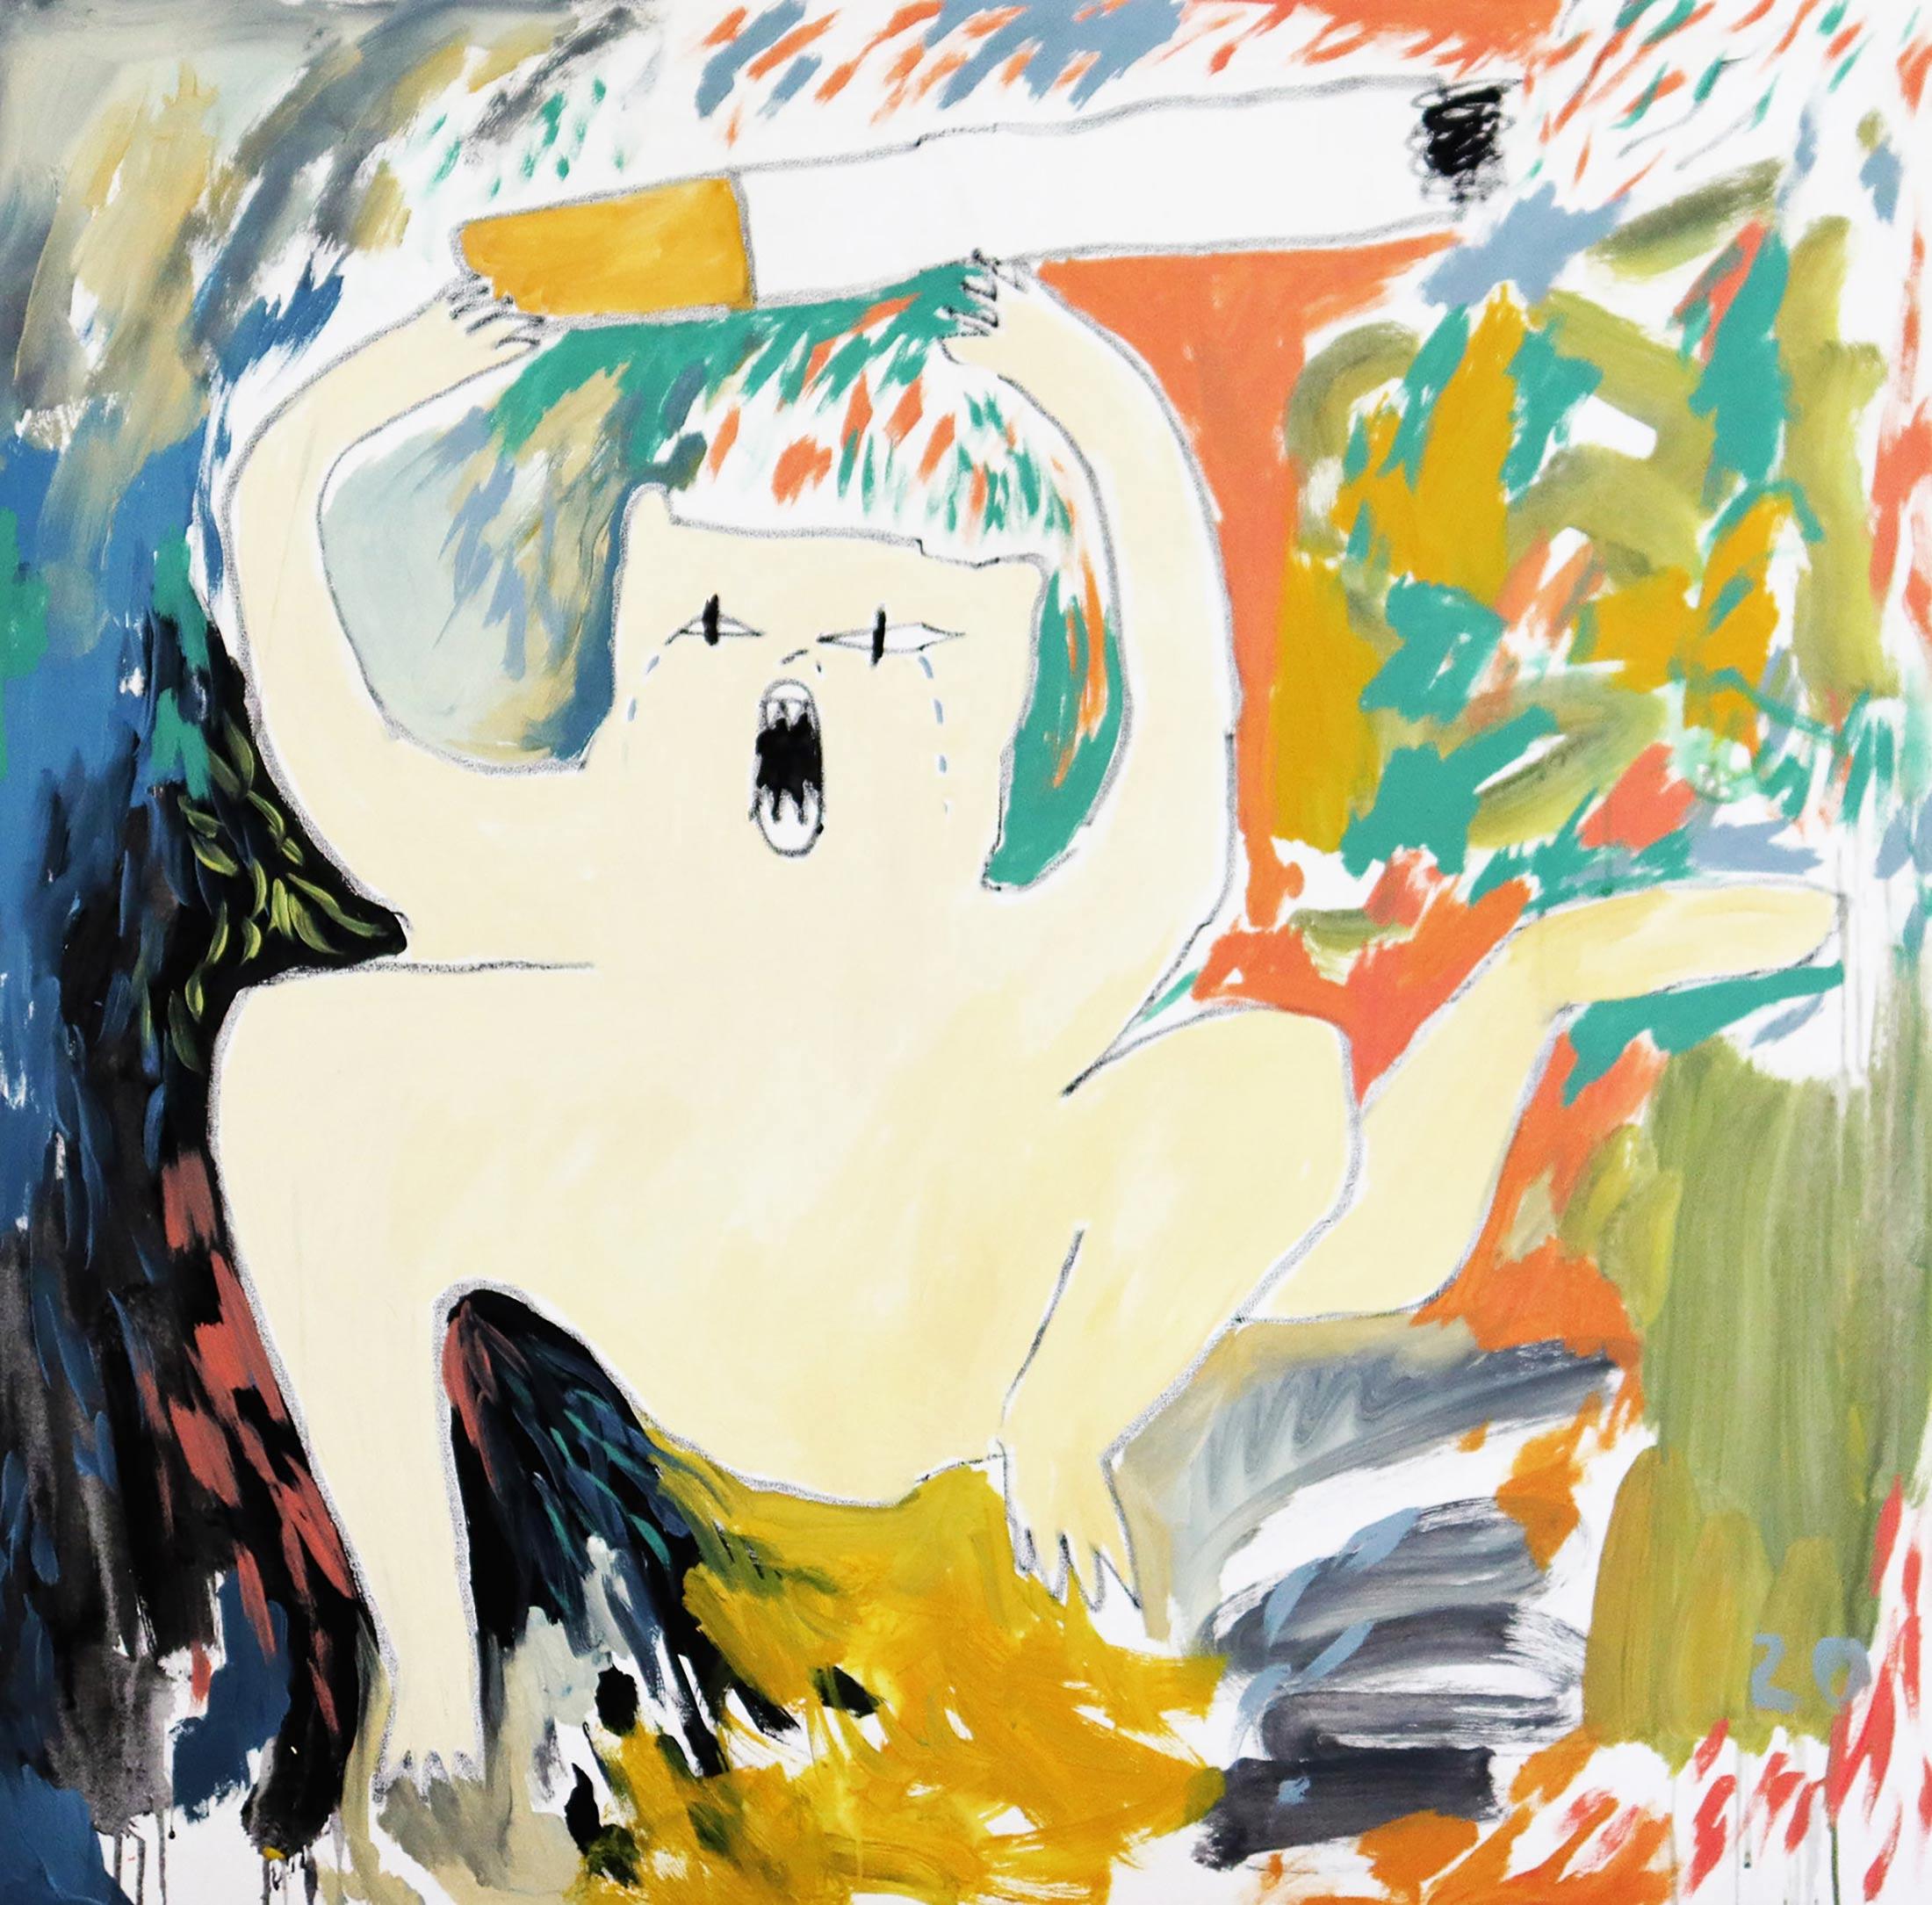 painting, abstract, artcollector, artadvisory, munchies art club, domi gratz